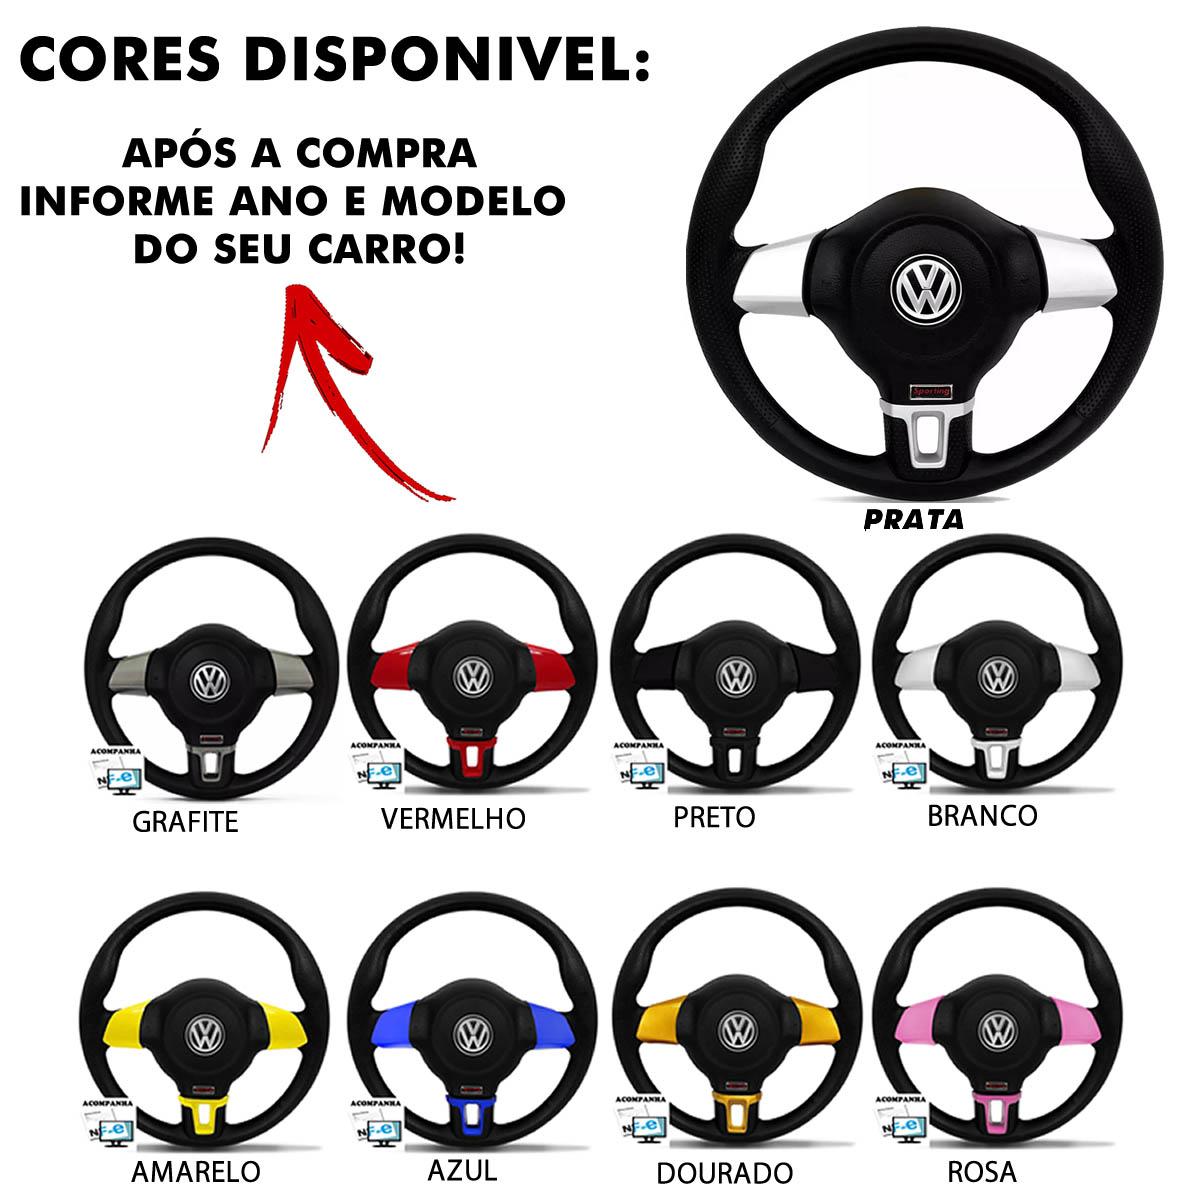 Volante Volkswagen Jetta Redondo Esportivo Cubo Gol 1980 a 2013 Golf 1999 a 2013 Saveiro Parati 1982 a 2013 Poliparts